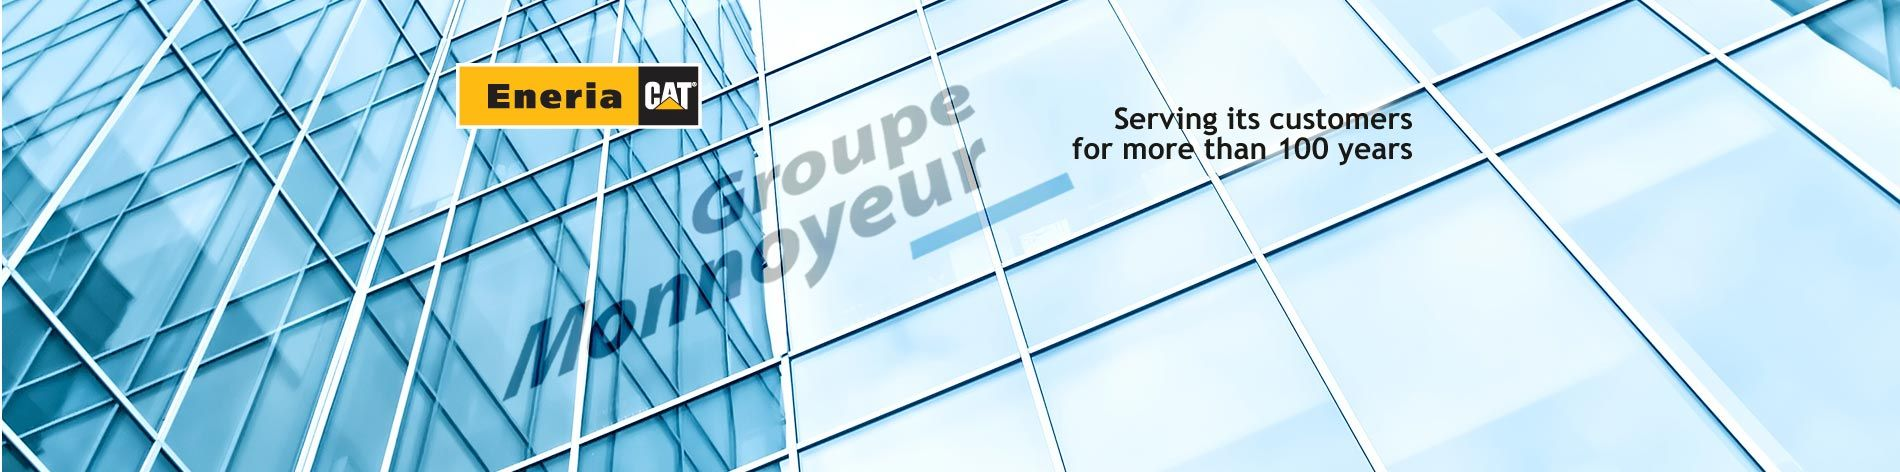 Like its sister companies Bergerat Monnoyeur, Aprolis and Magellan, Eneria is a member of the Monnoyeur Group.